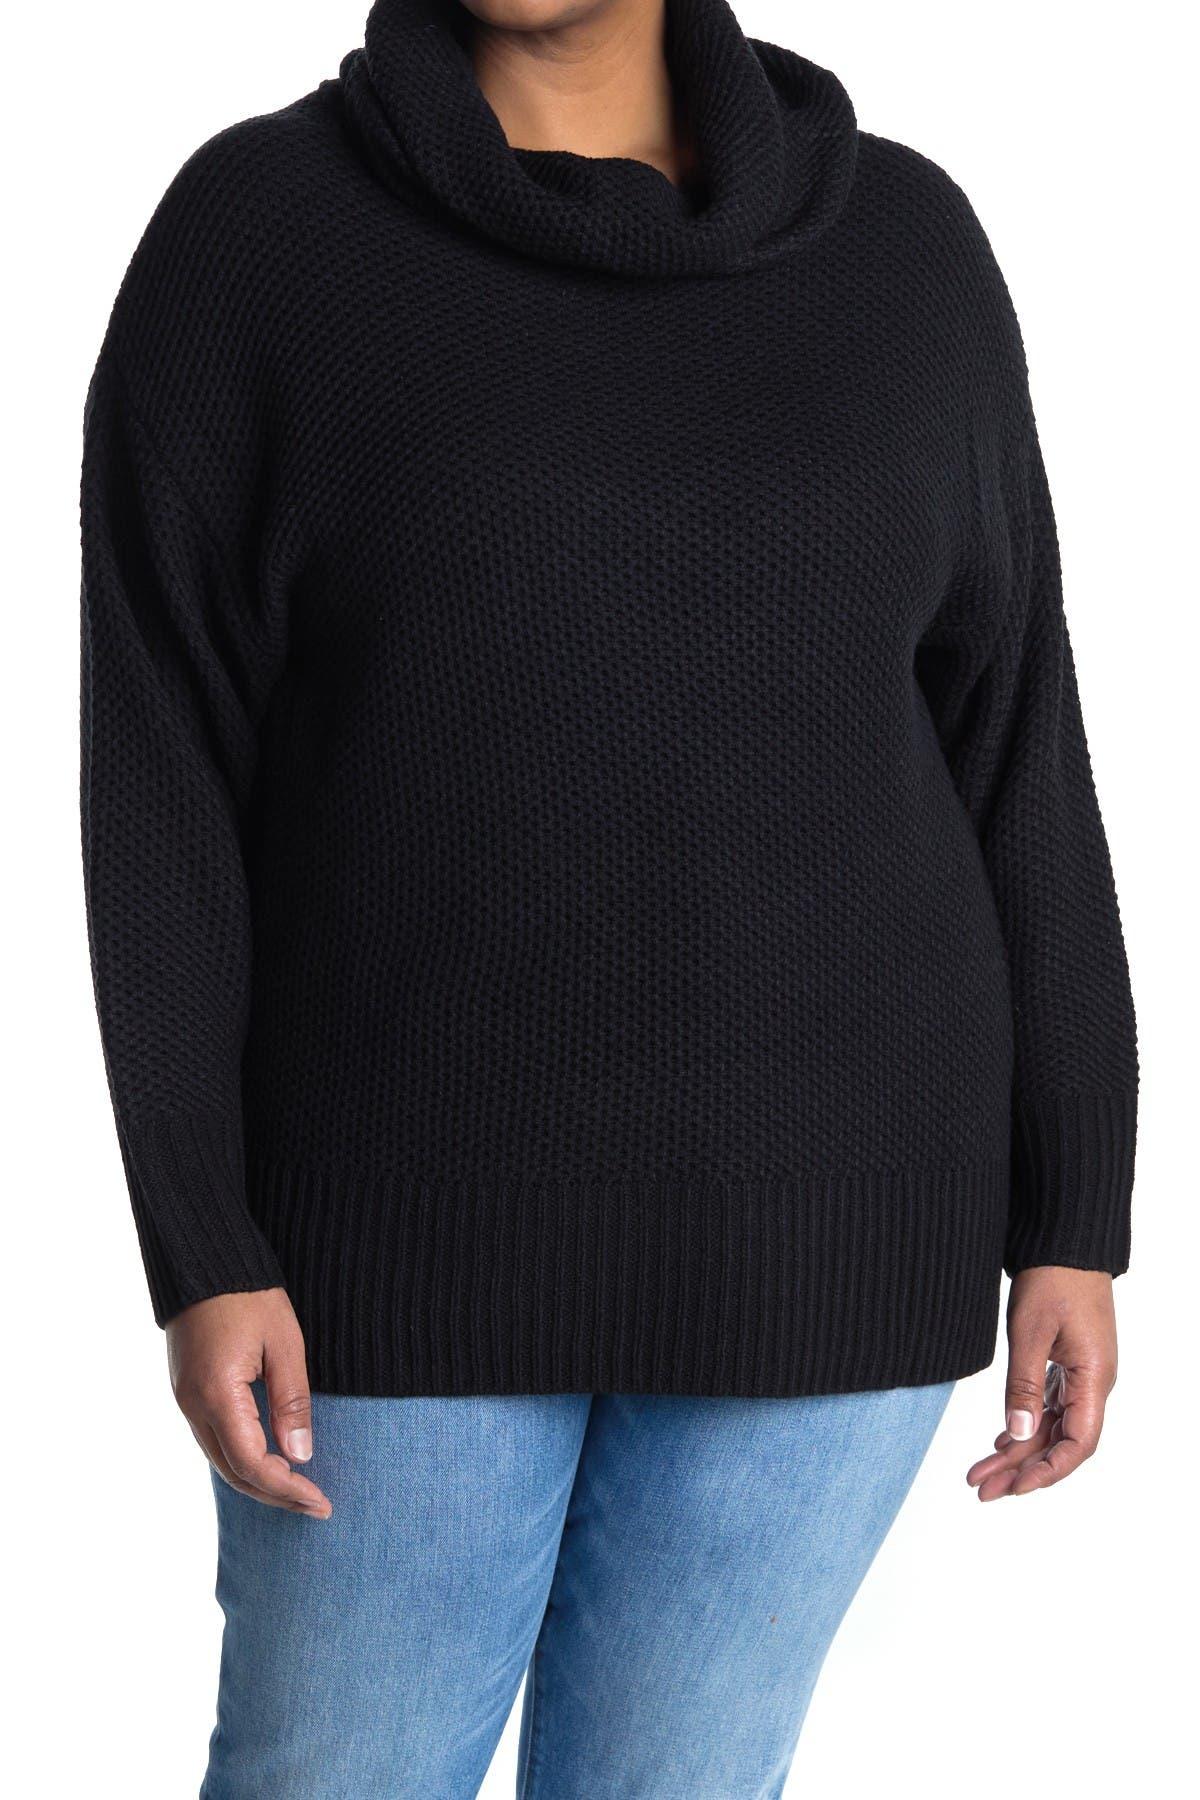 Image of Sanctuary Cowl Neck Tunic Sweater